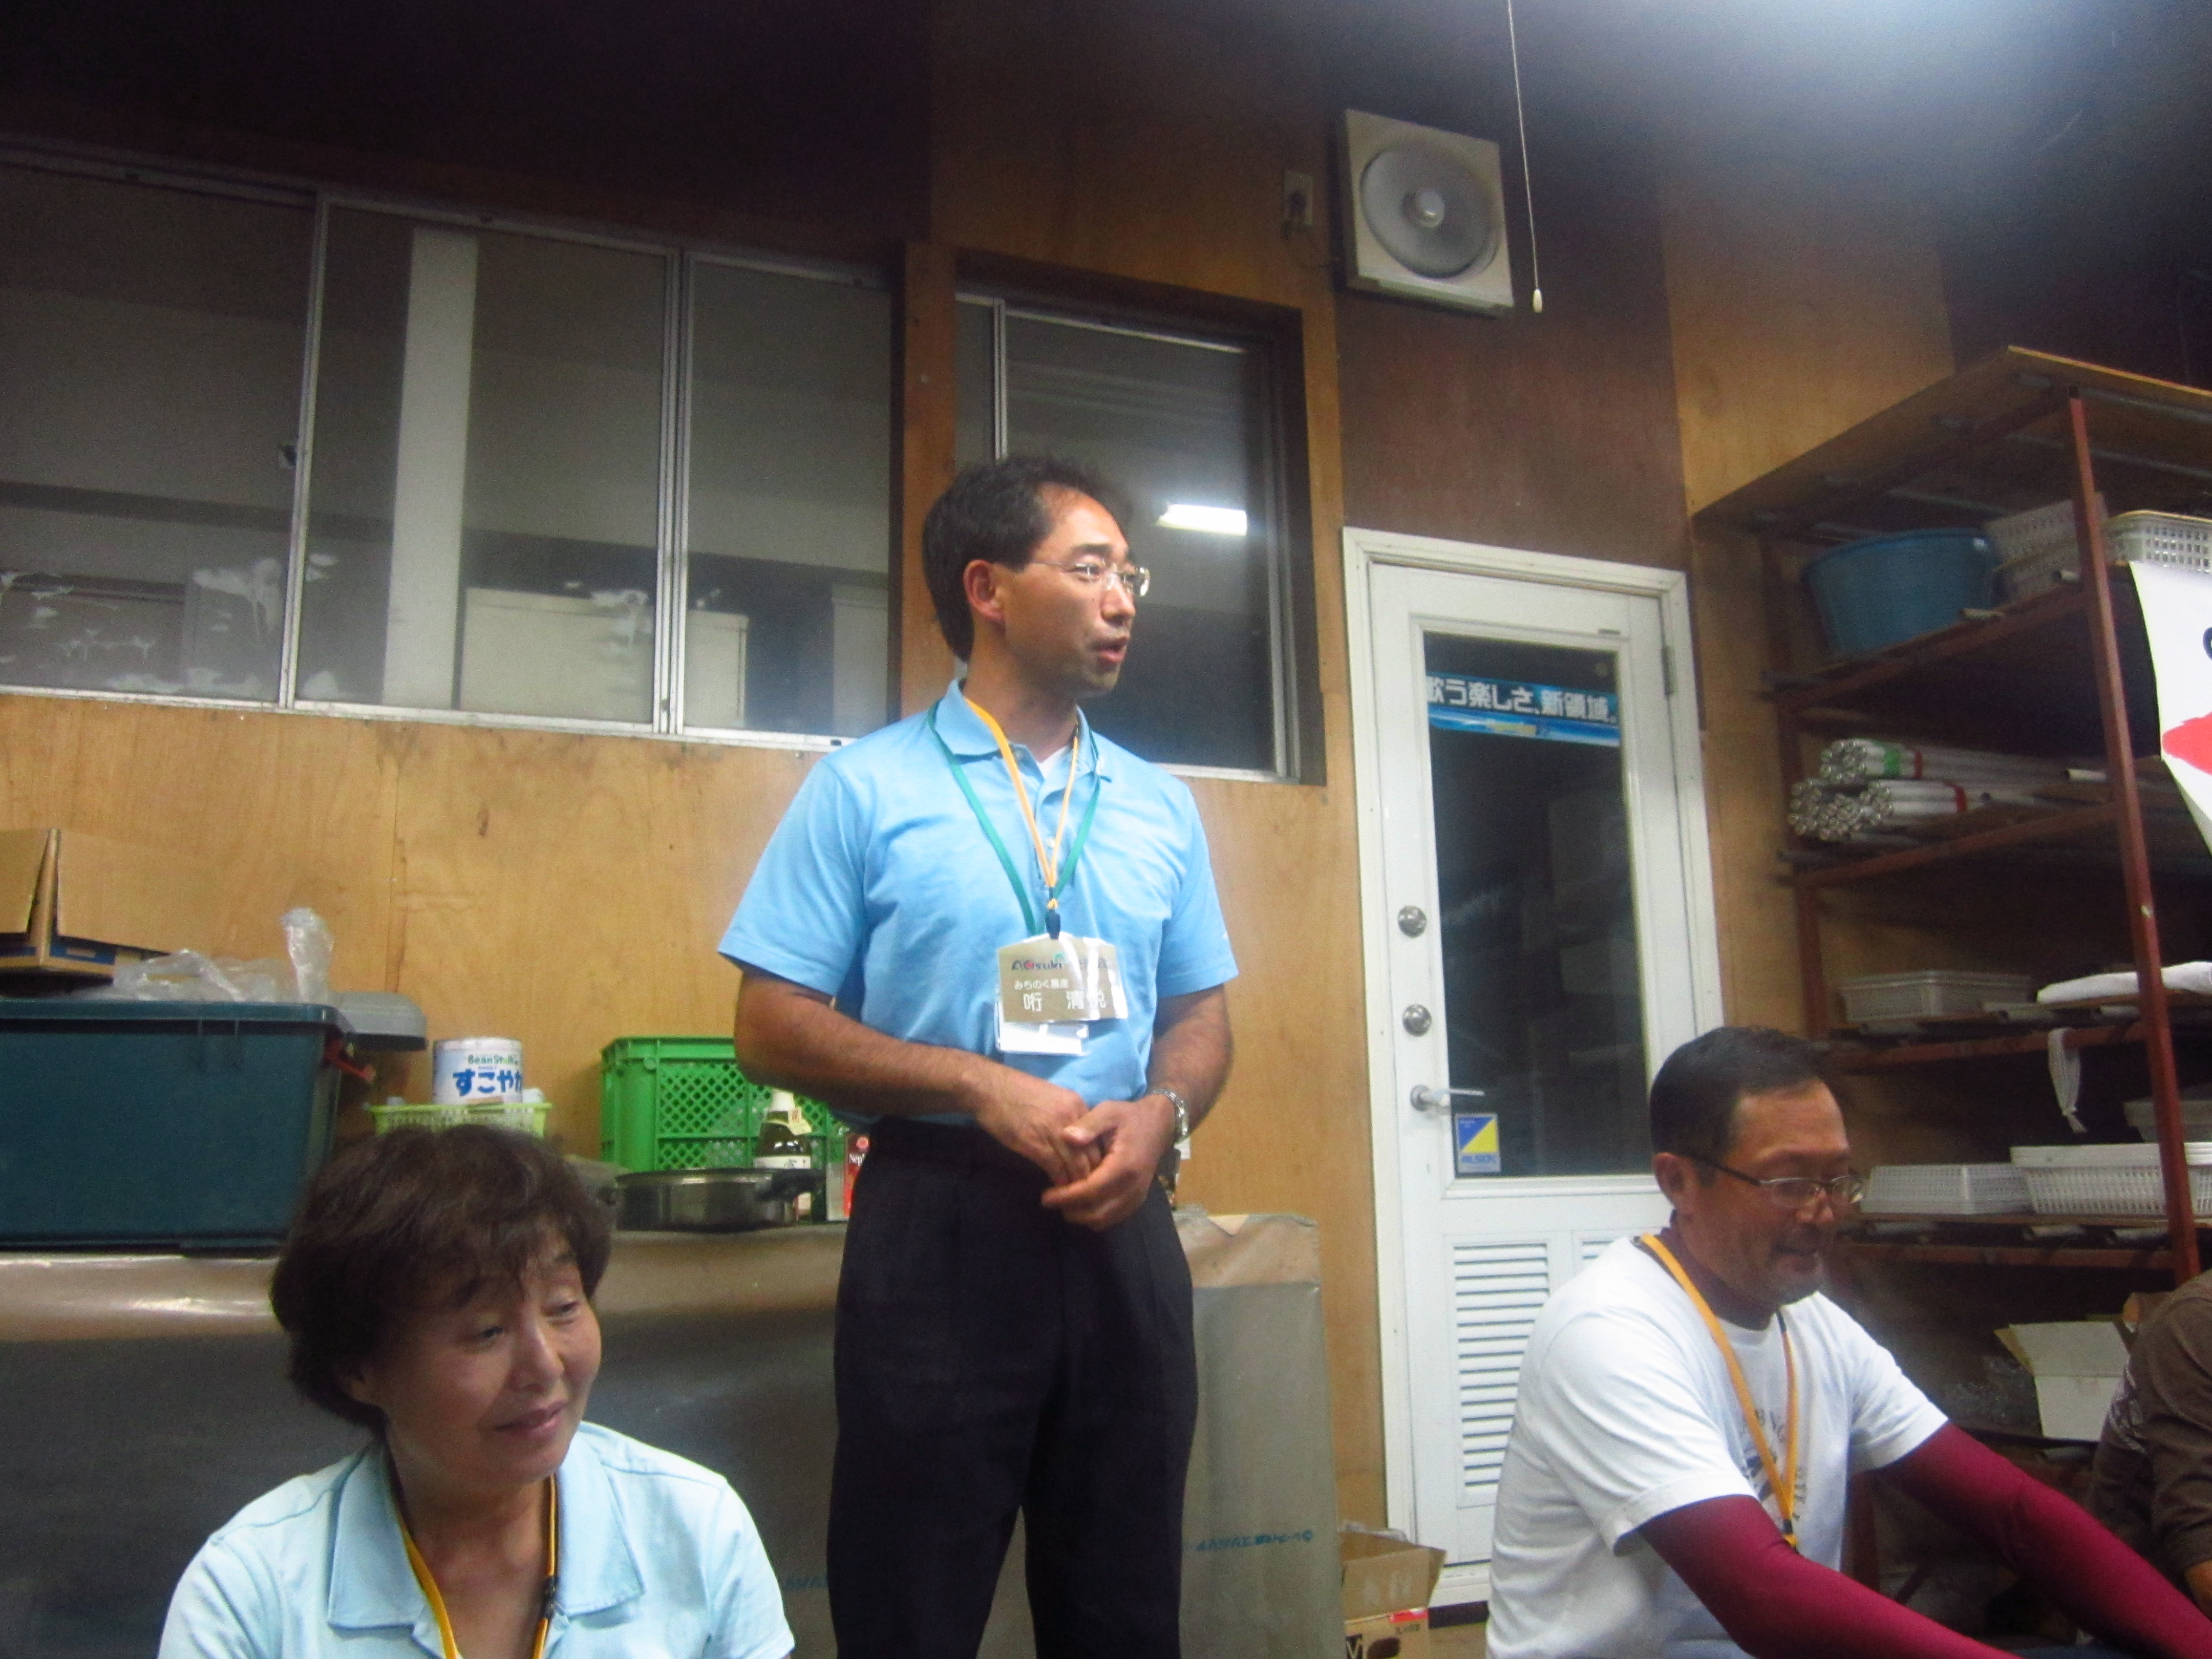 IMG 4294 - 麻布十番納涼祭り25,26日(七戸町出店)